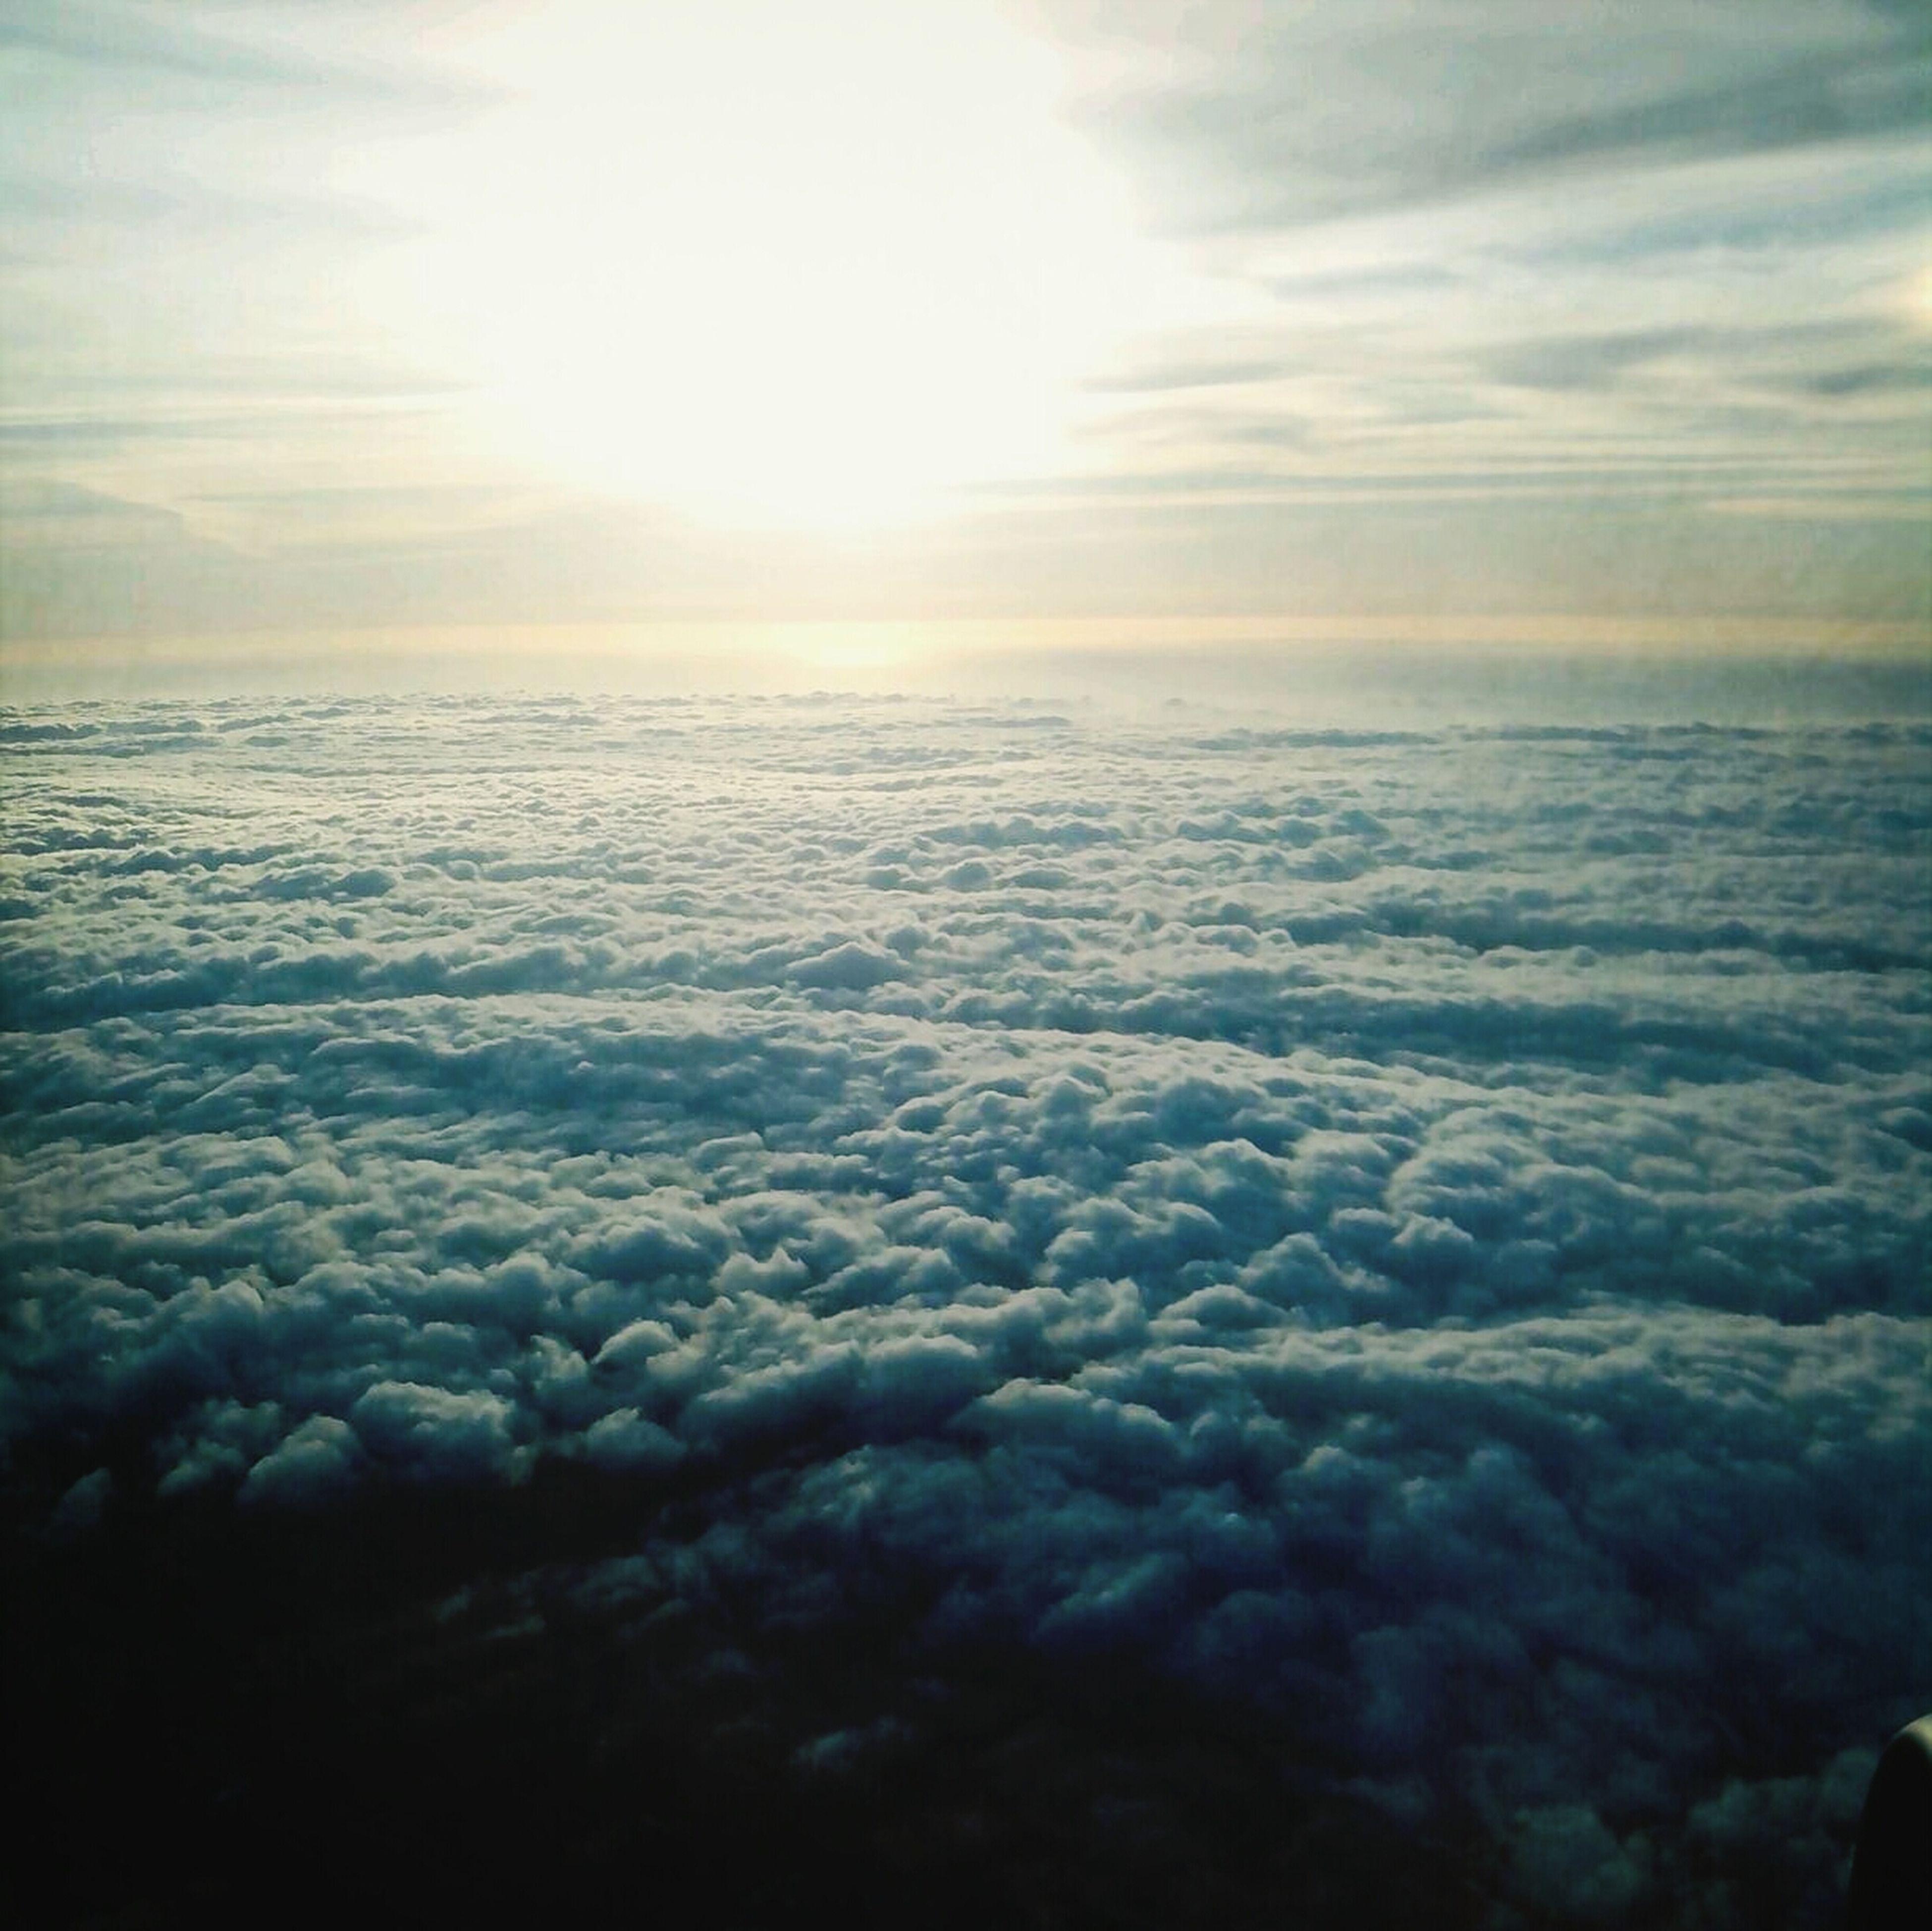 scenics, beauty in nature, tranquil scene, tranquility, sky, sun, sea, nature, sunset, cloud - sky, water, sunbeam, sunlight, idyllic, horizon over water, weather, winter, outdoors, cloud, cold temperature